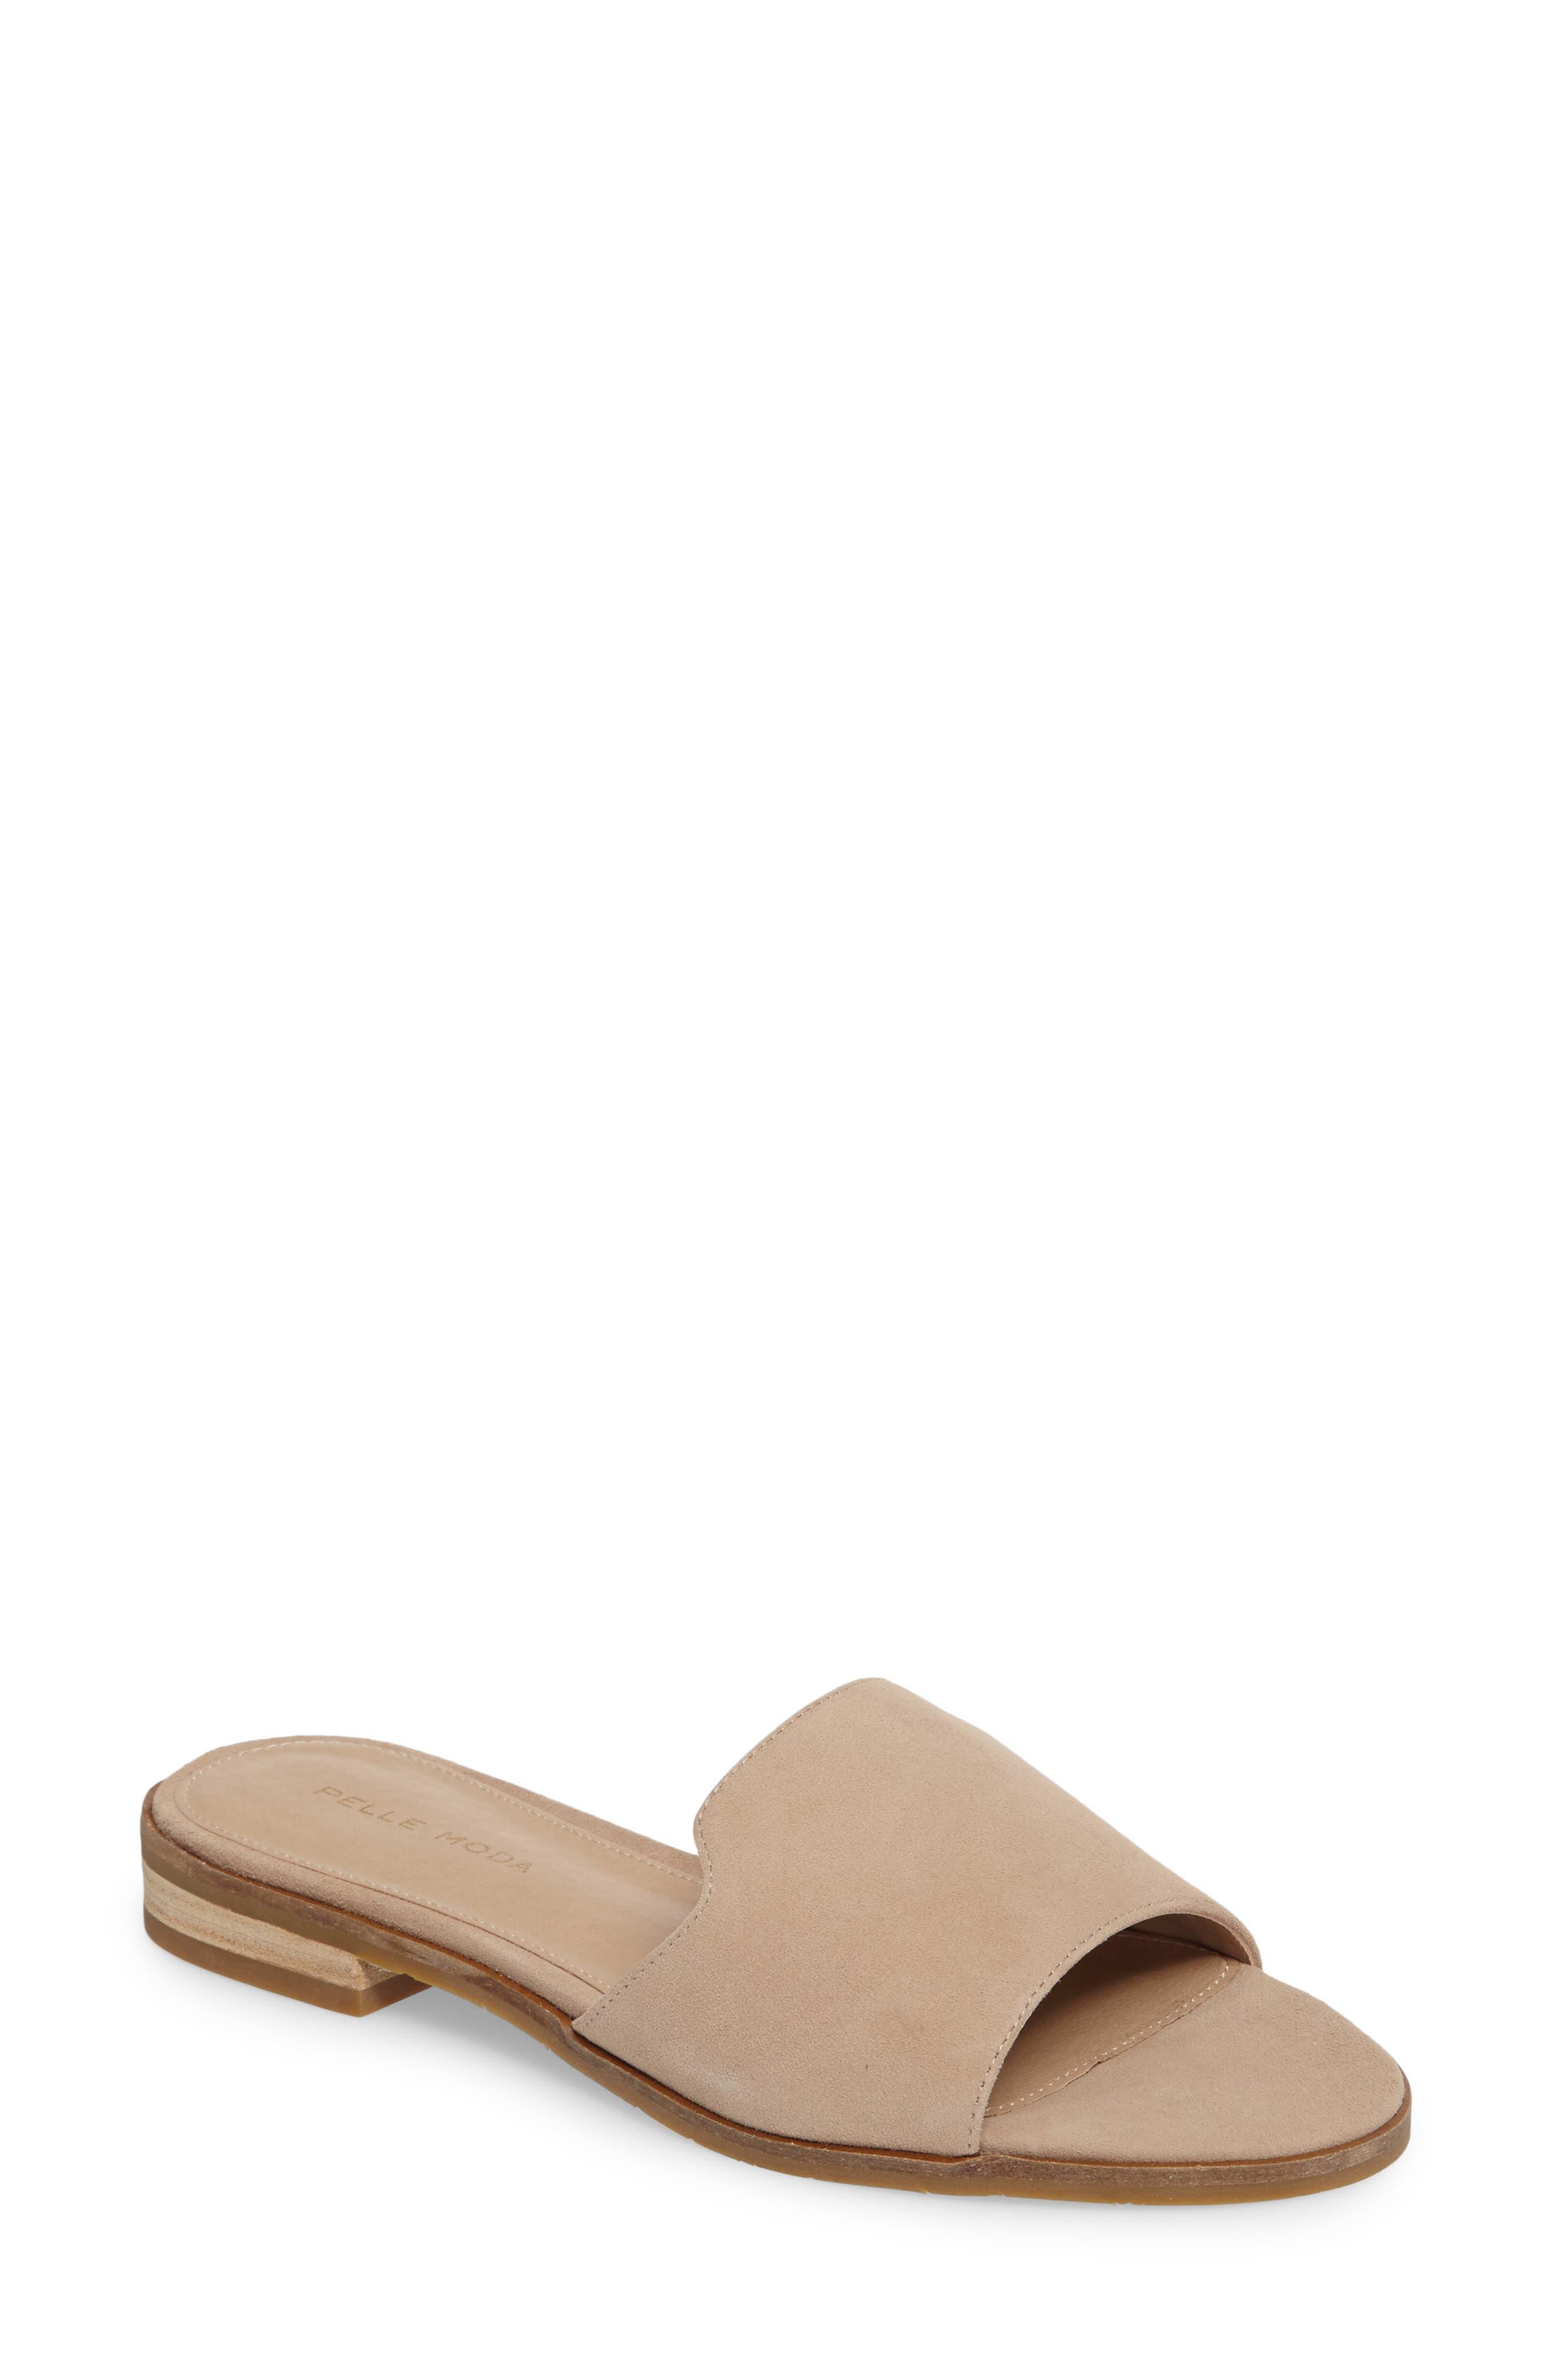 Hailey Slide Sandal,                             Main thumbnail 1, color,                             Sand Leather